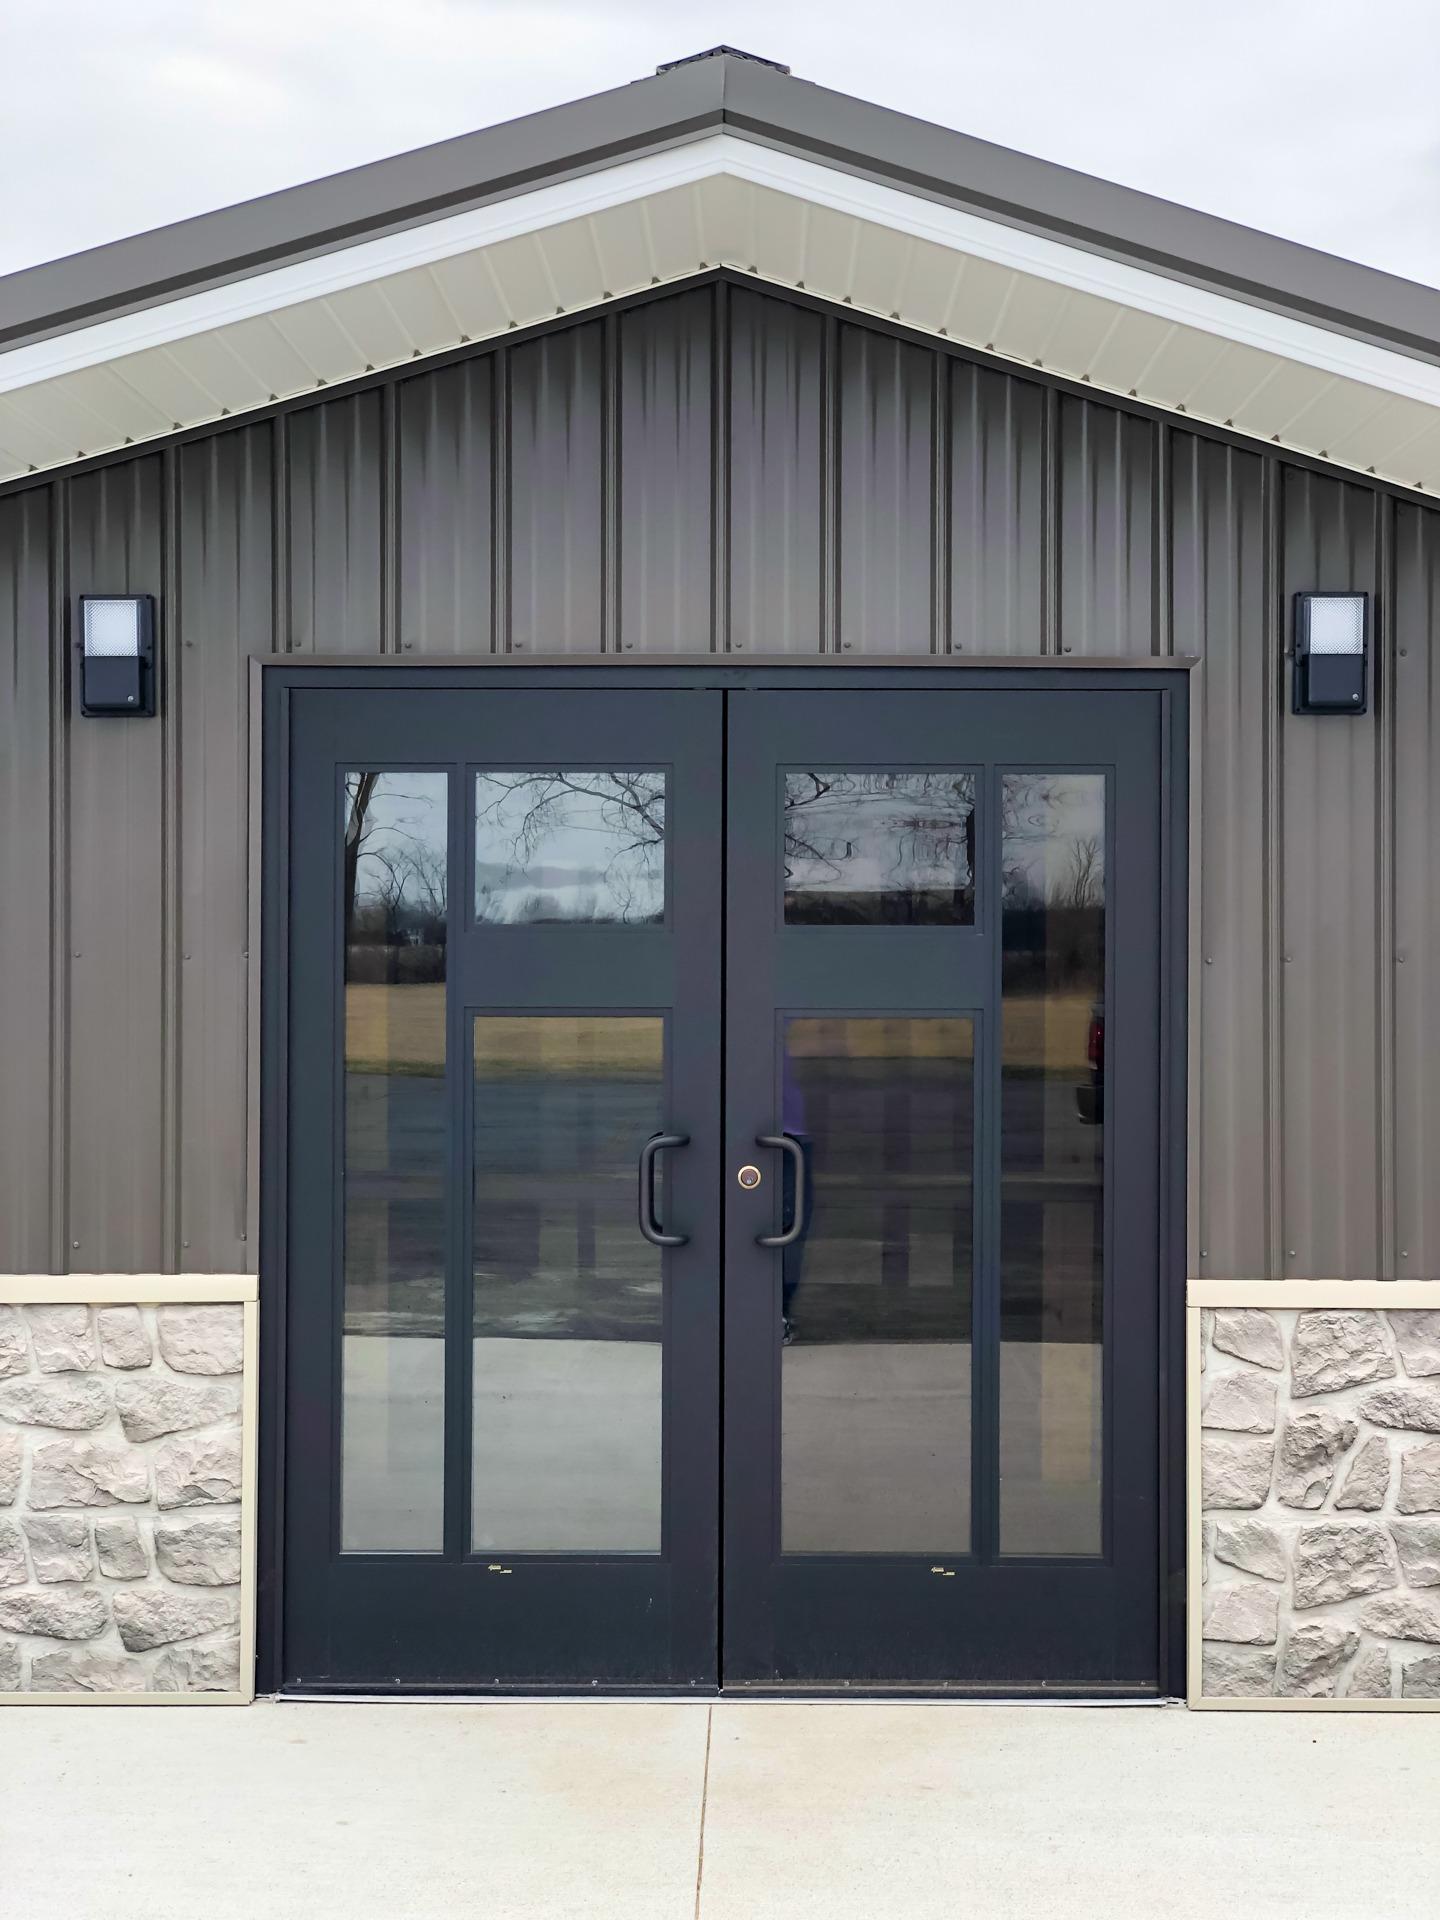 MS-400 Stile and Rail Door